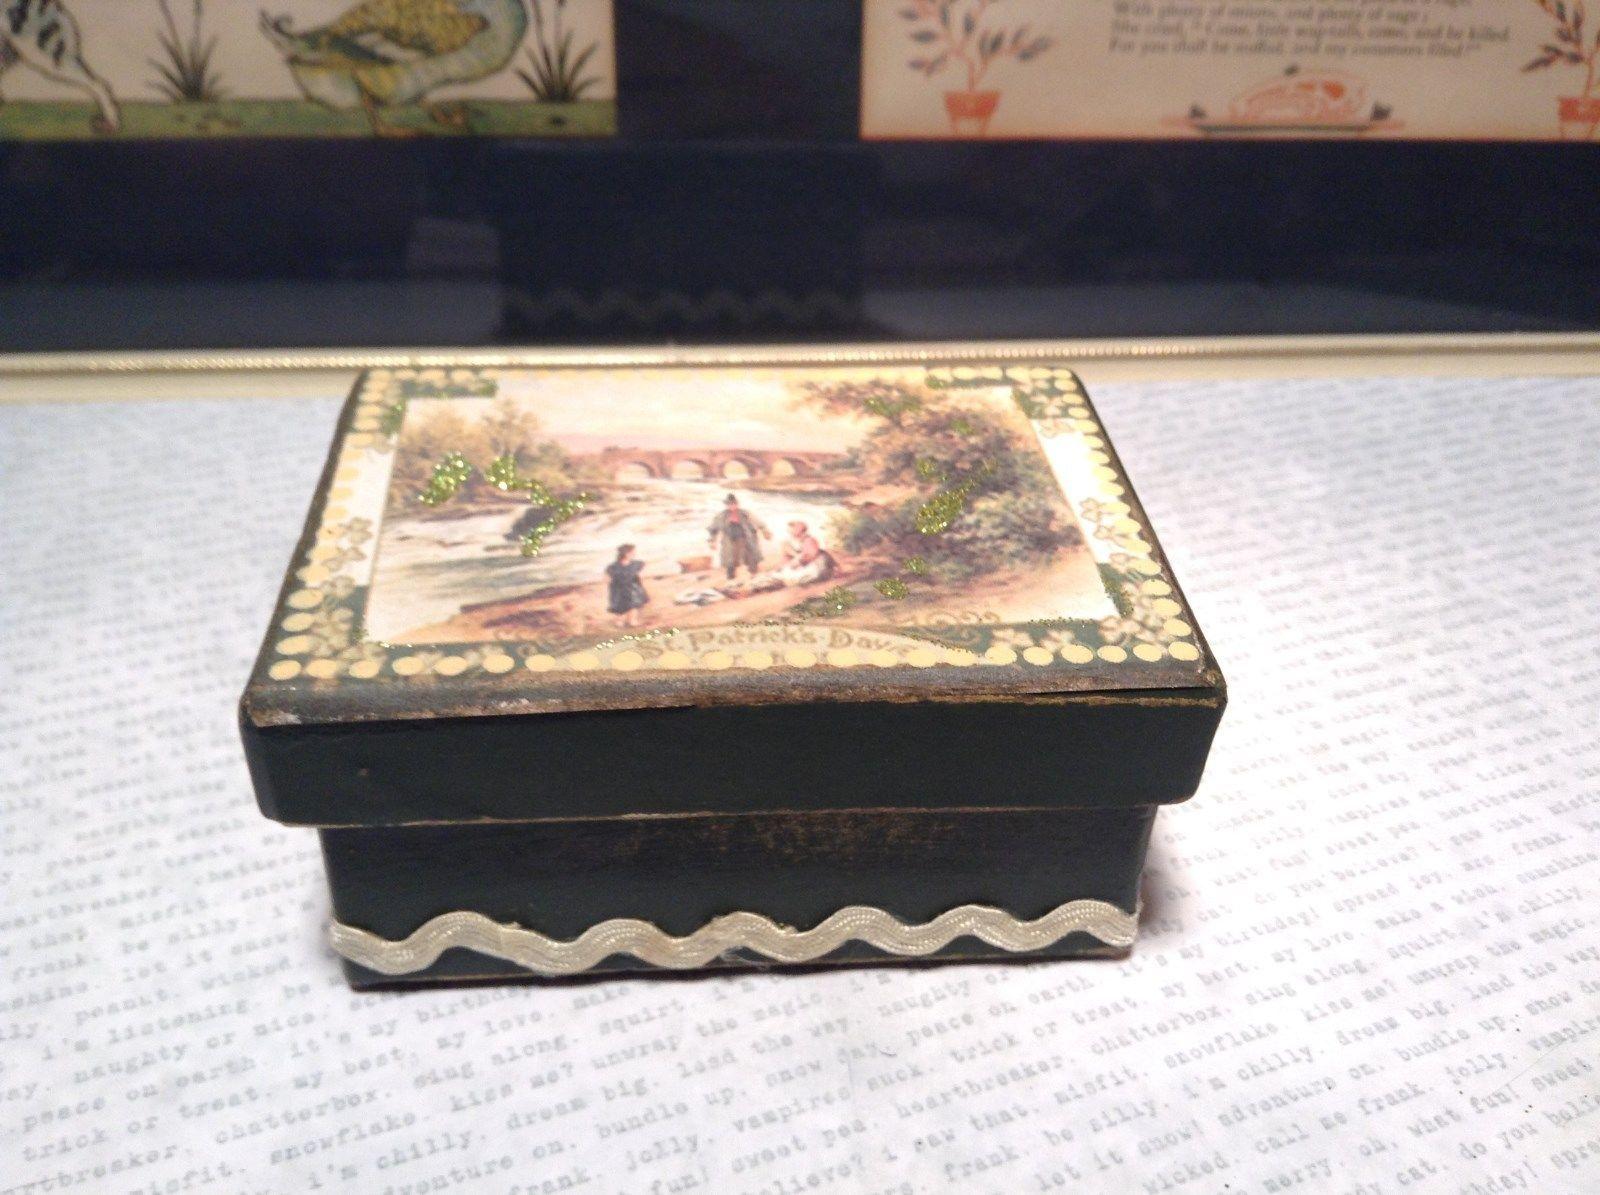 St Patricks Day River Scene Green Heavy Duty Paperboard Trinket Box Vintage Look